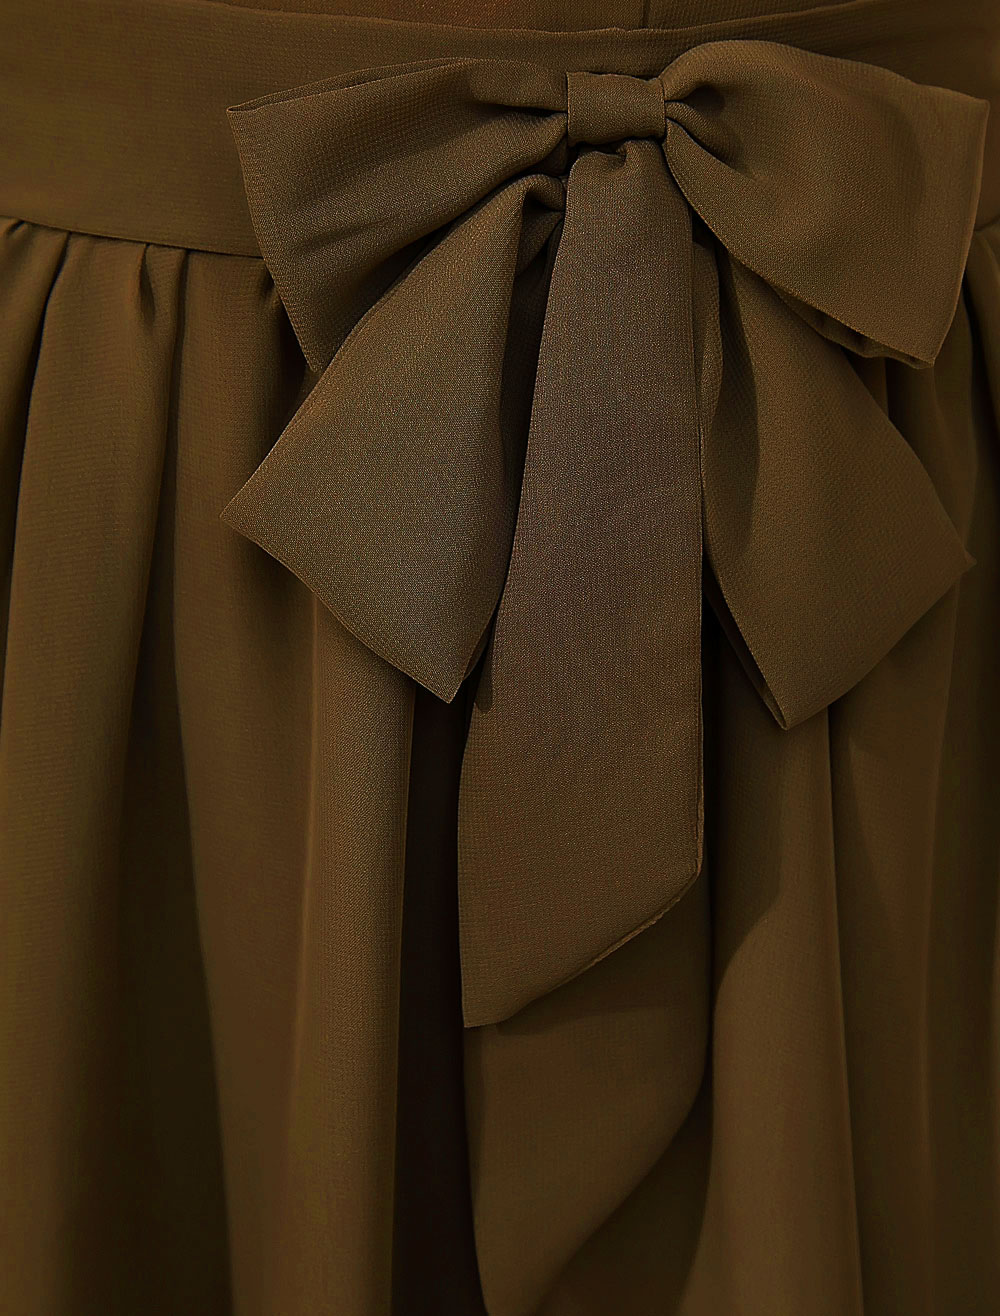 713a4ed0f6 Vestido de cóctel 2019 marrón con escote redondo con manga corta con lazo - No.